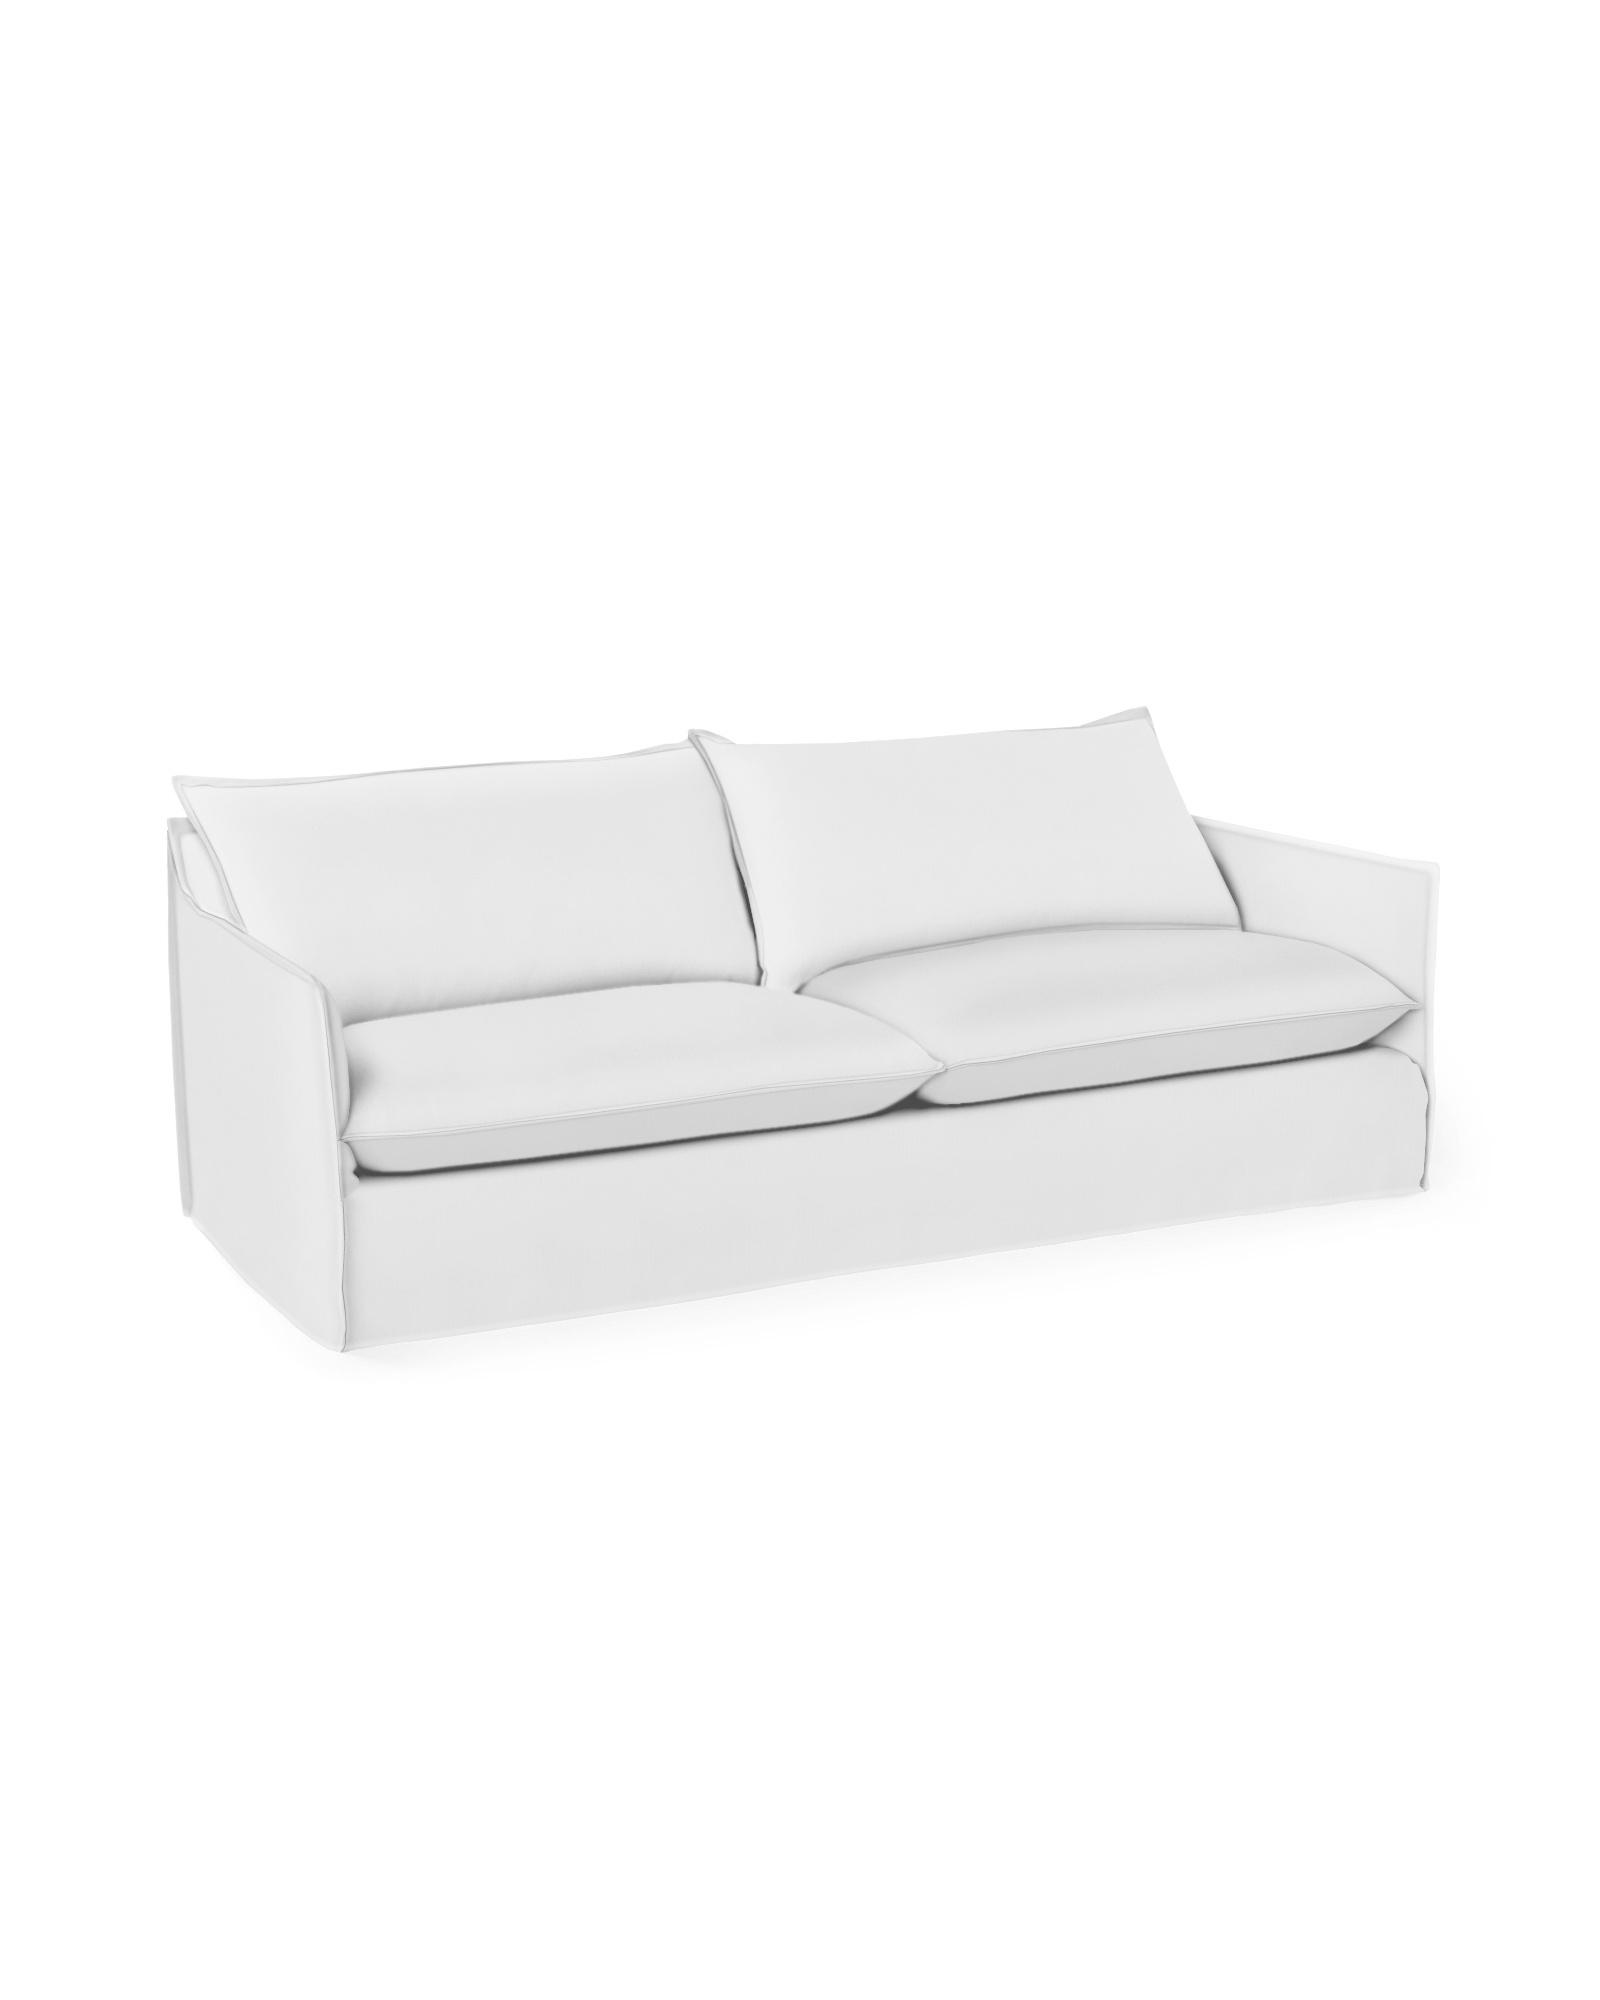 Sundial Outdoor Sofa - Slipcovered